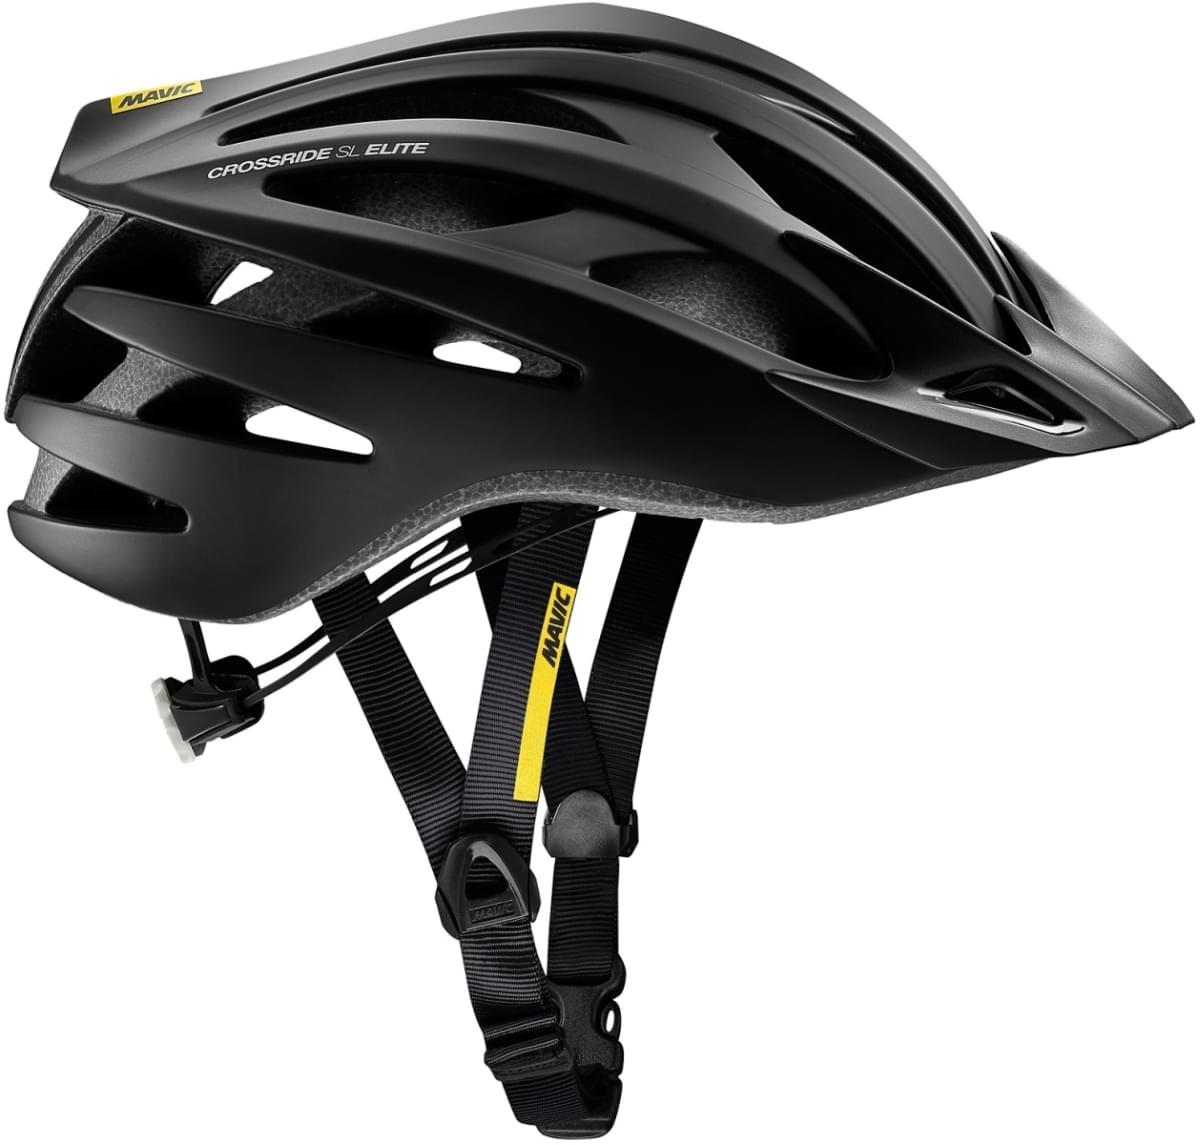 Mavic Crossride SL Elite Helmet - Black/White M-(54-59)